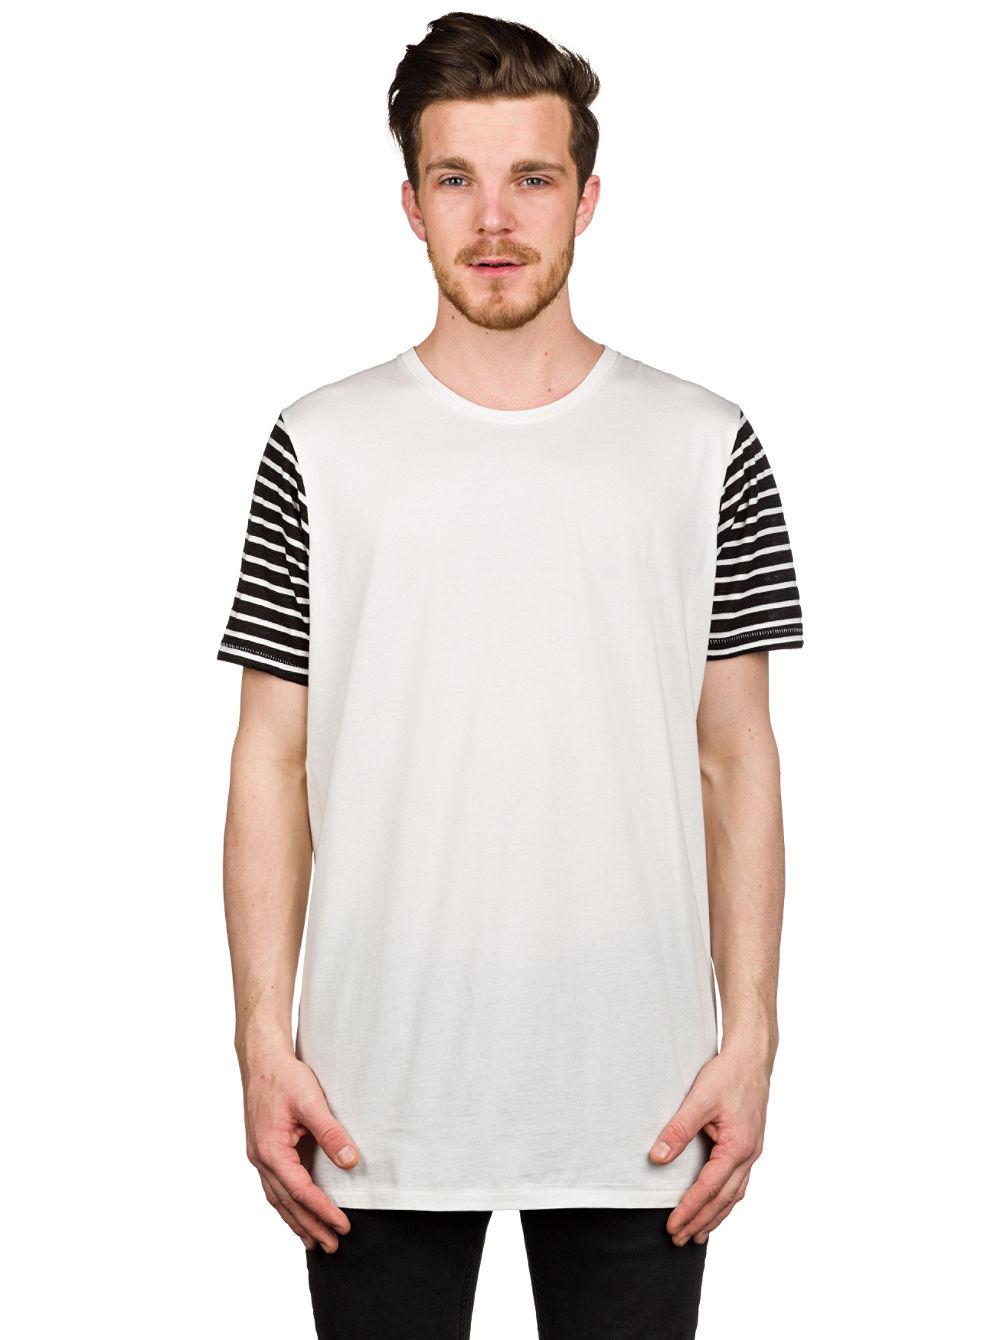 globe-hawksburn-t-shirt